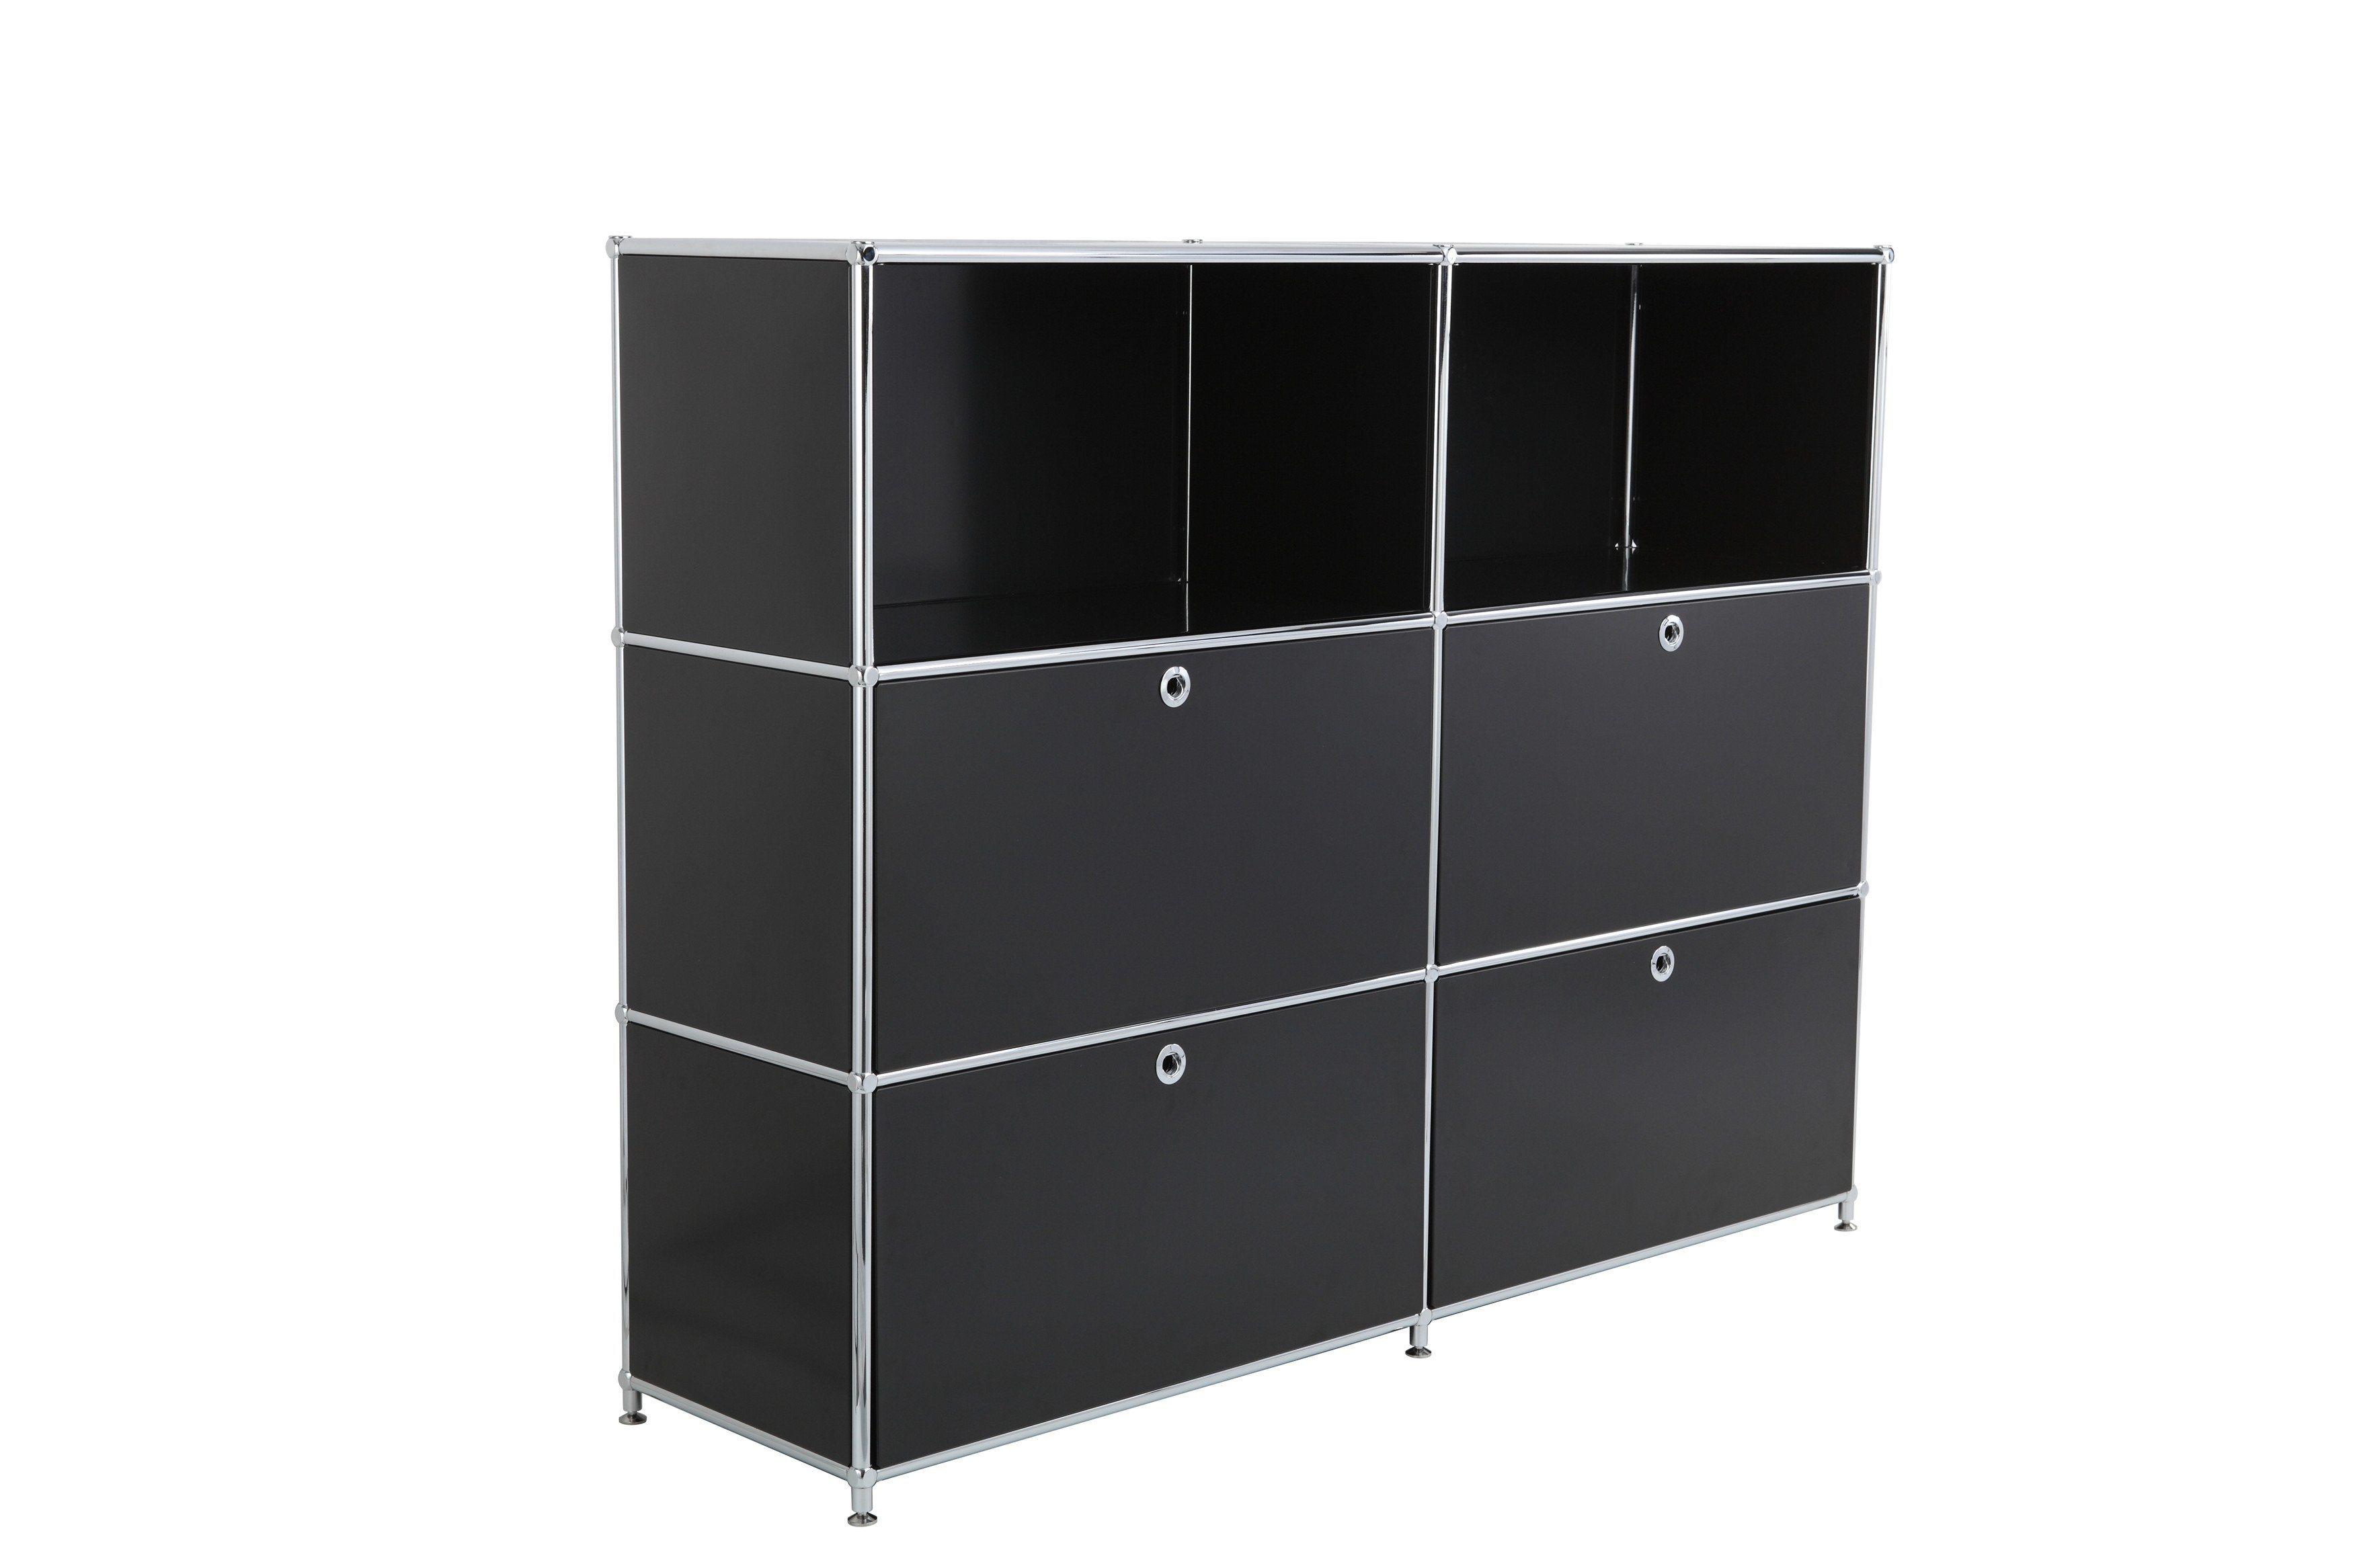 Sturdy 4 Door Steel Storage Modular DIY Office Transcube Modular Filing Cabinet